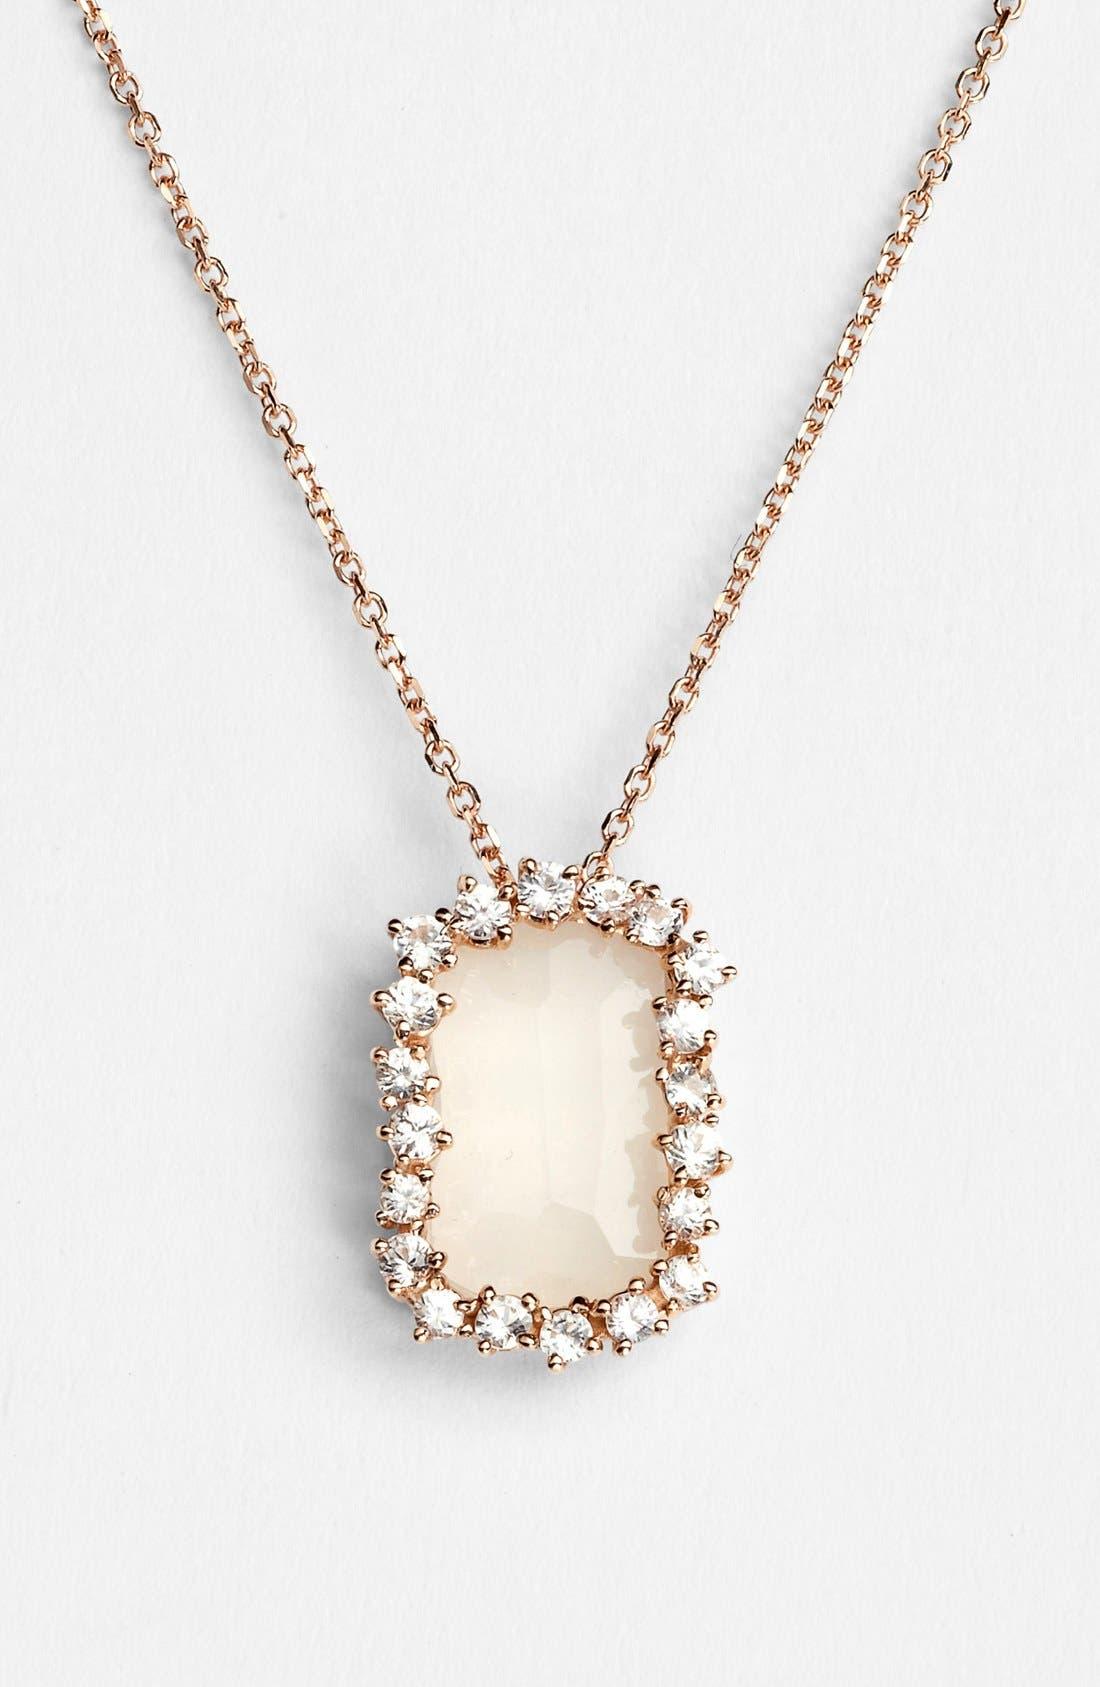 Main Image - KALAN by Suzanne Kalan Barrel Stone Pendant Necklace